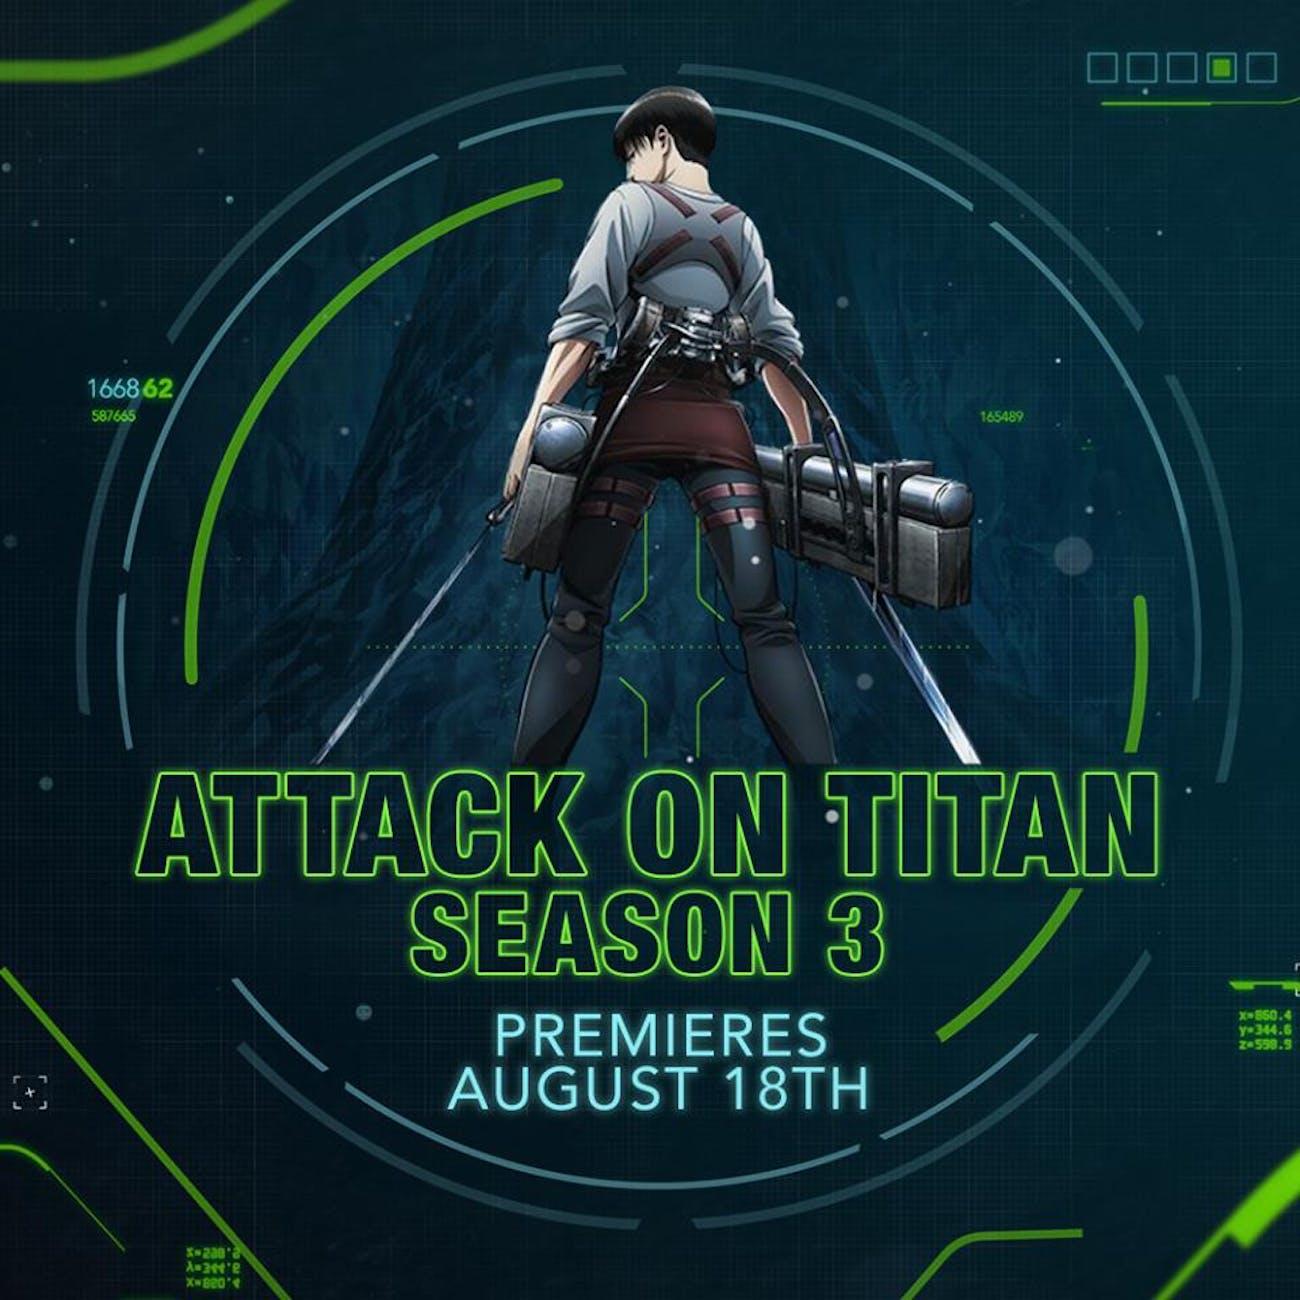 'Attack on Titan' Season 3 English dubs will air on Toonami starting August 18.